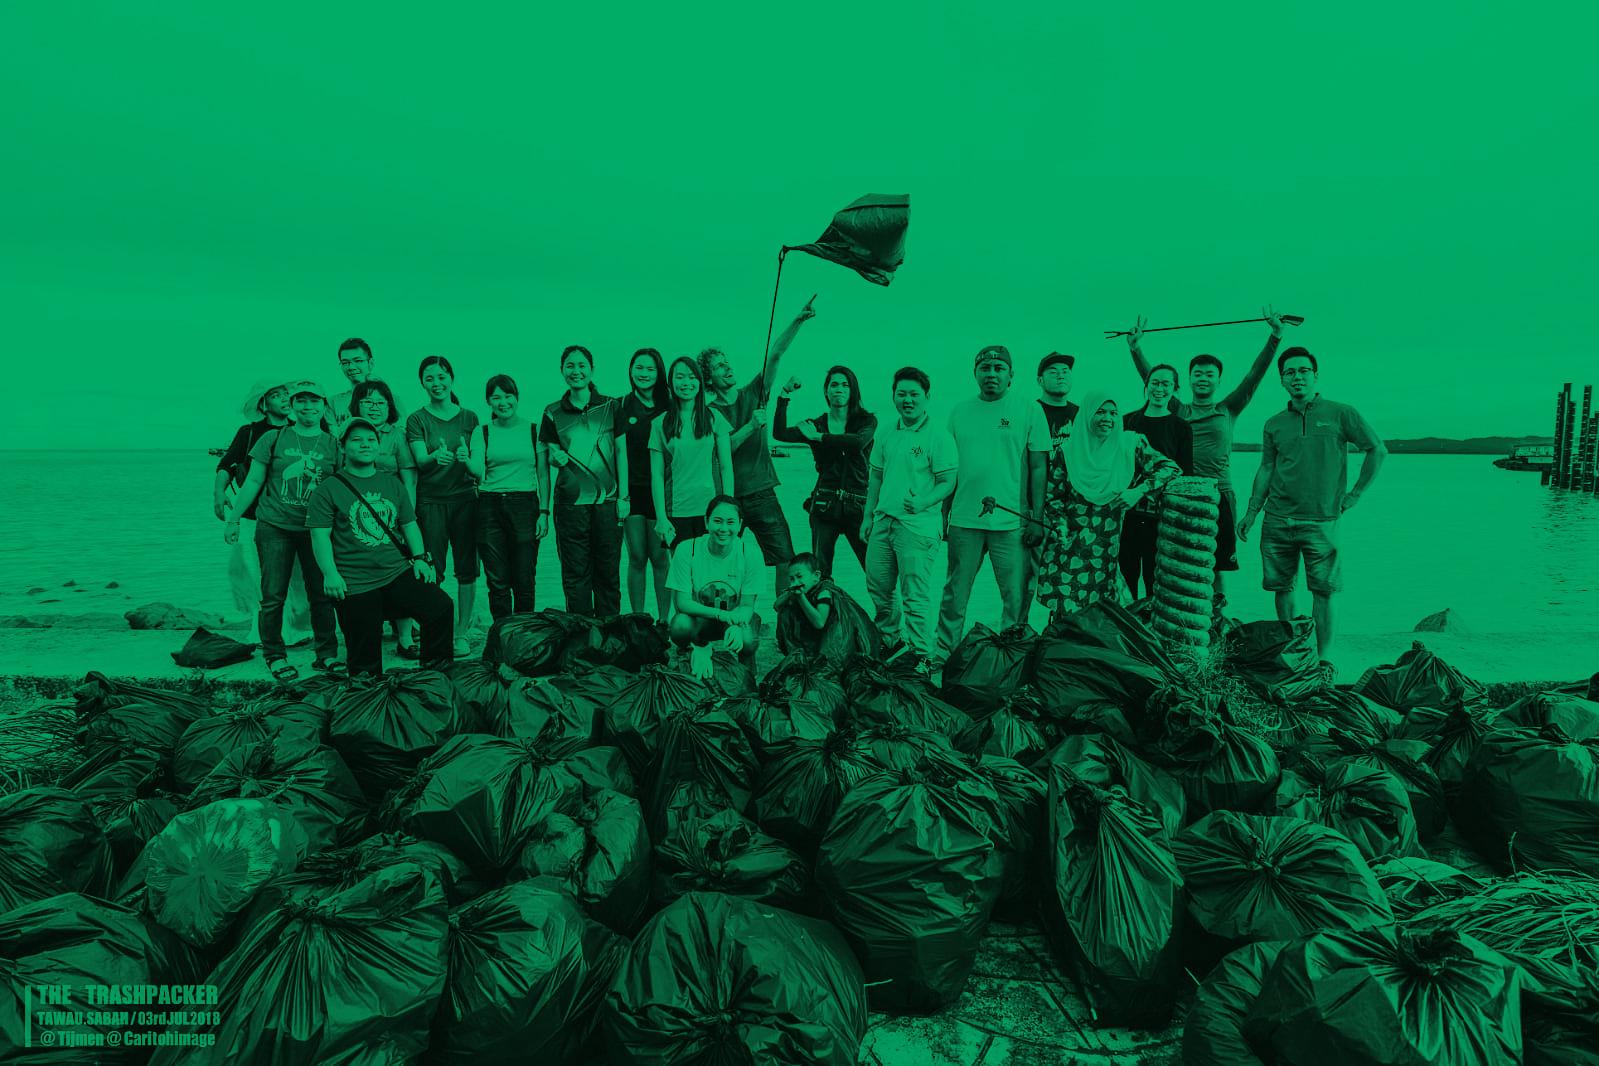 Trashpackers Vietnam